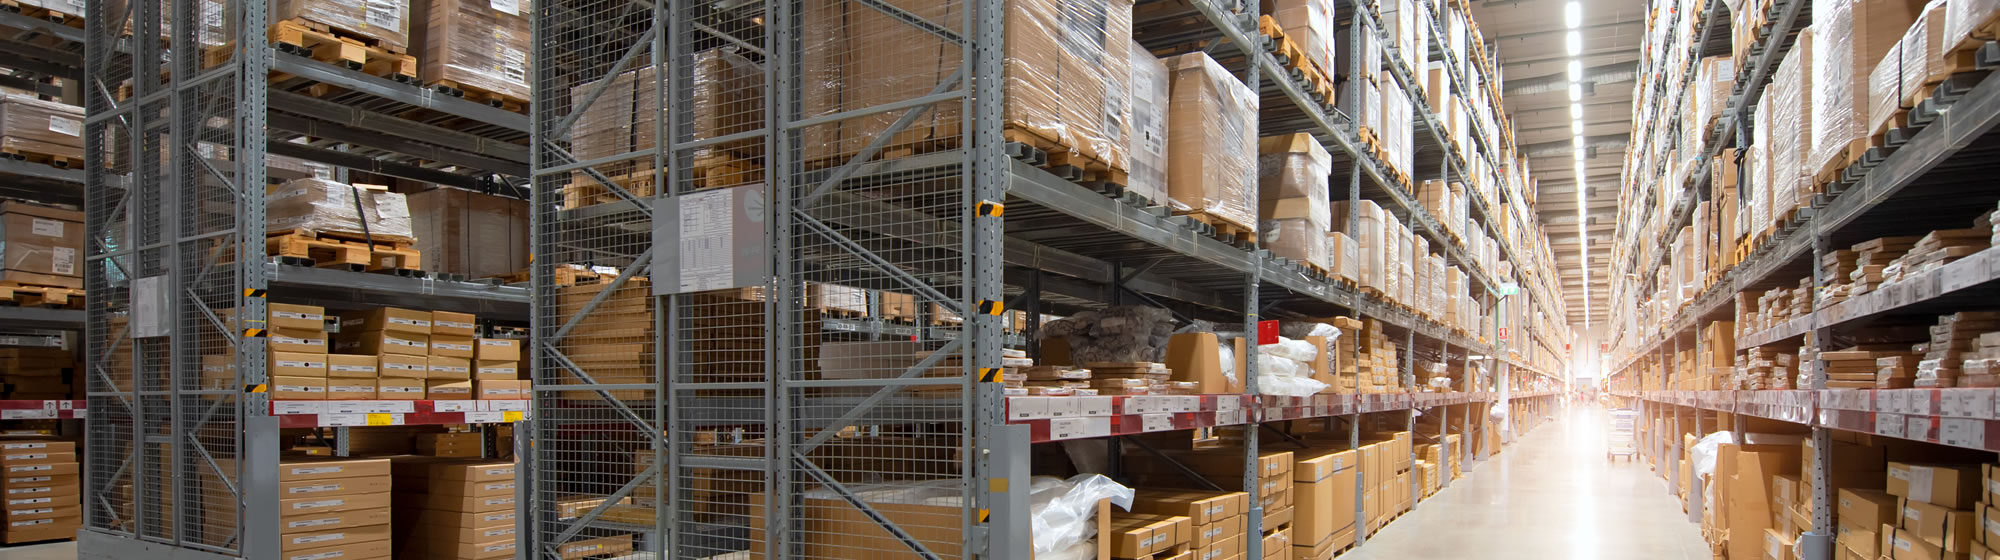 banner-warehousing